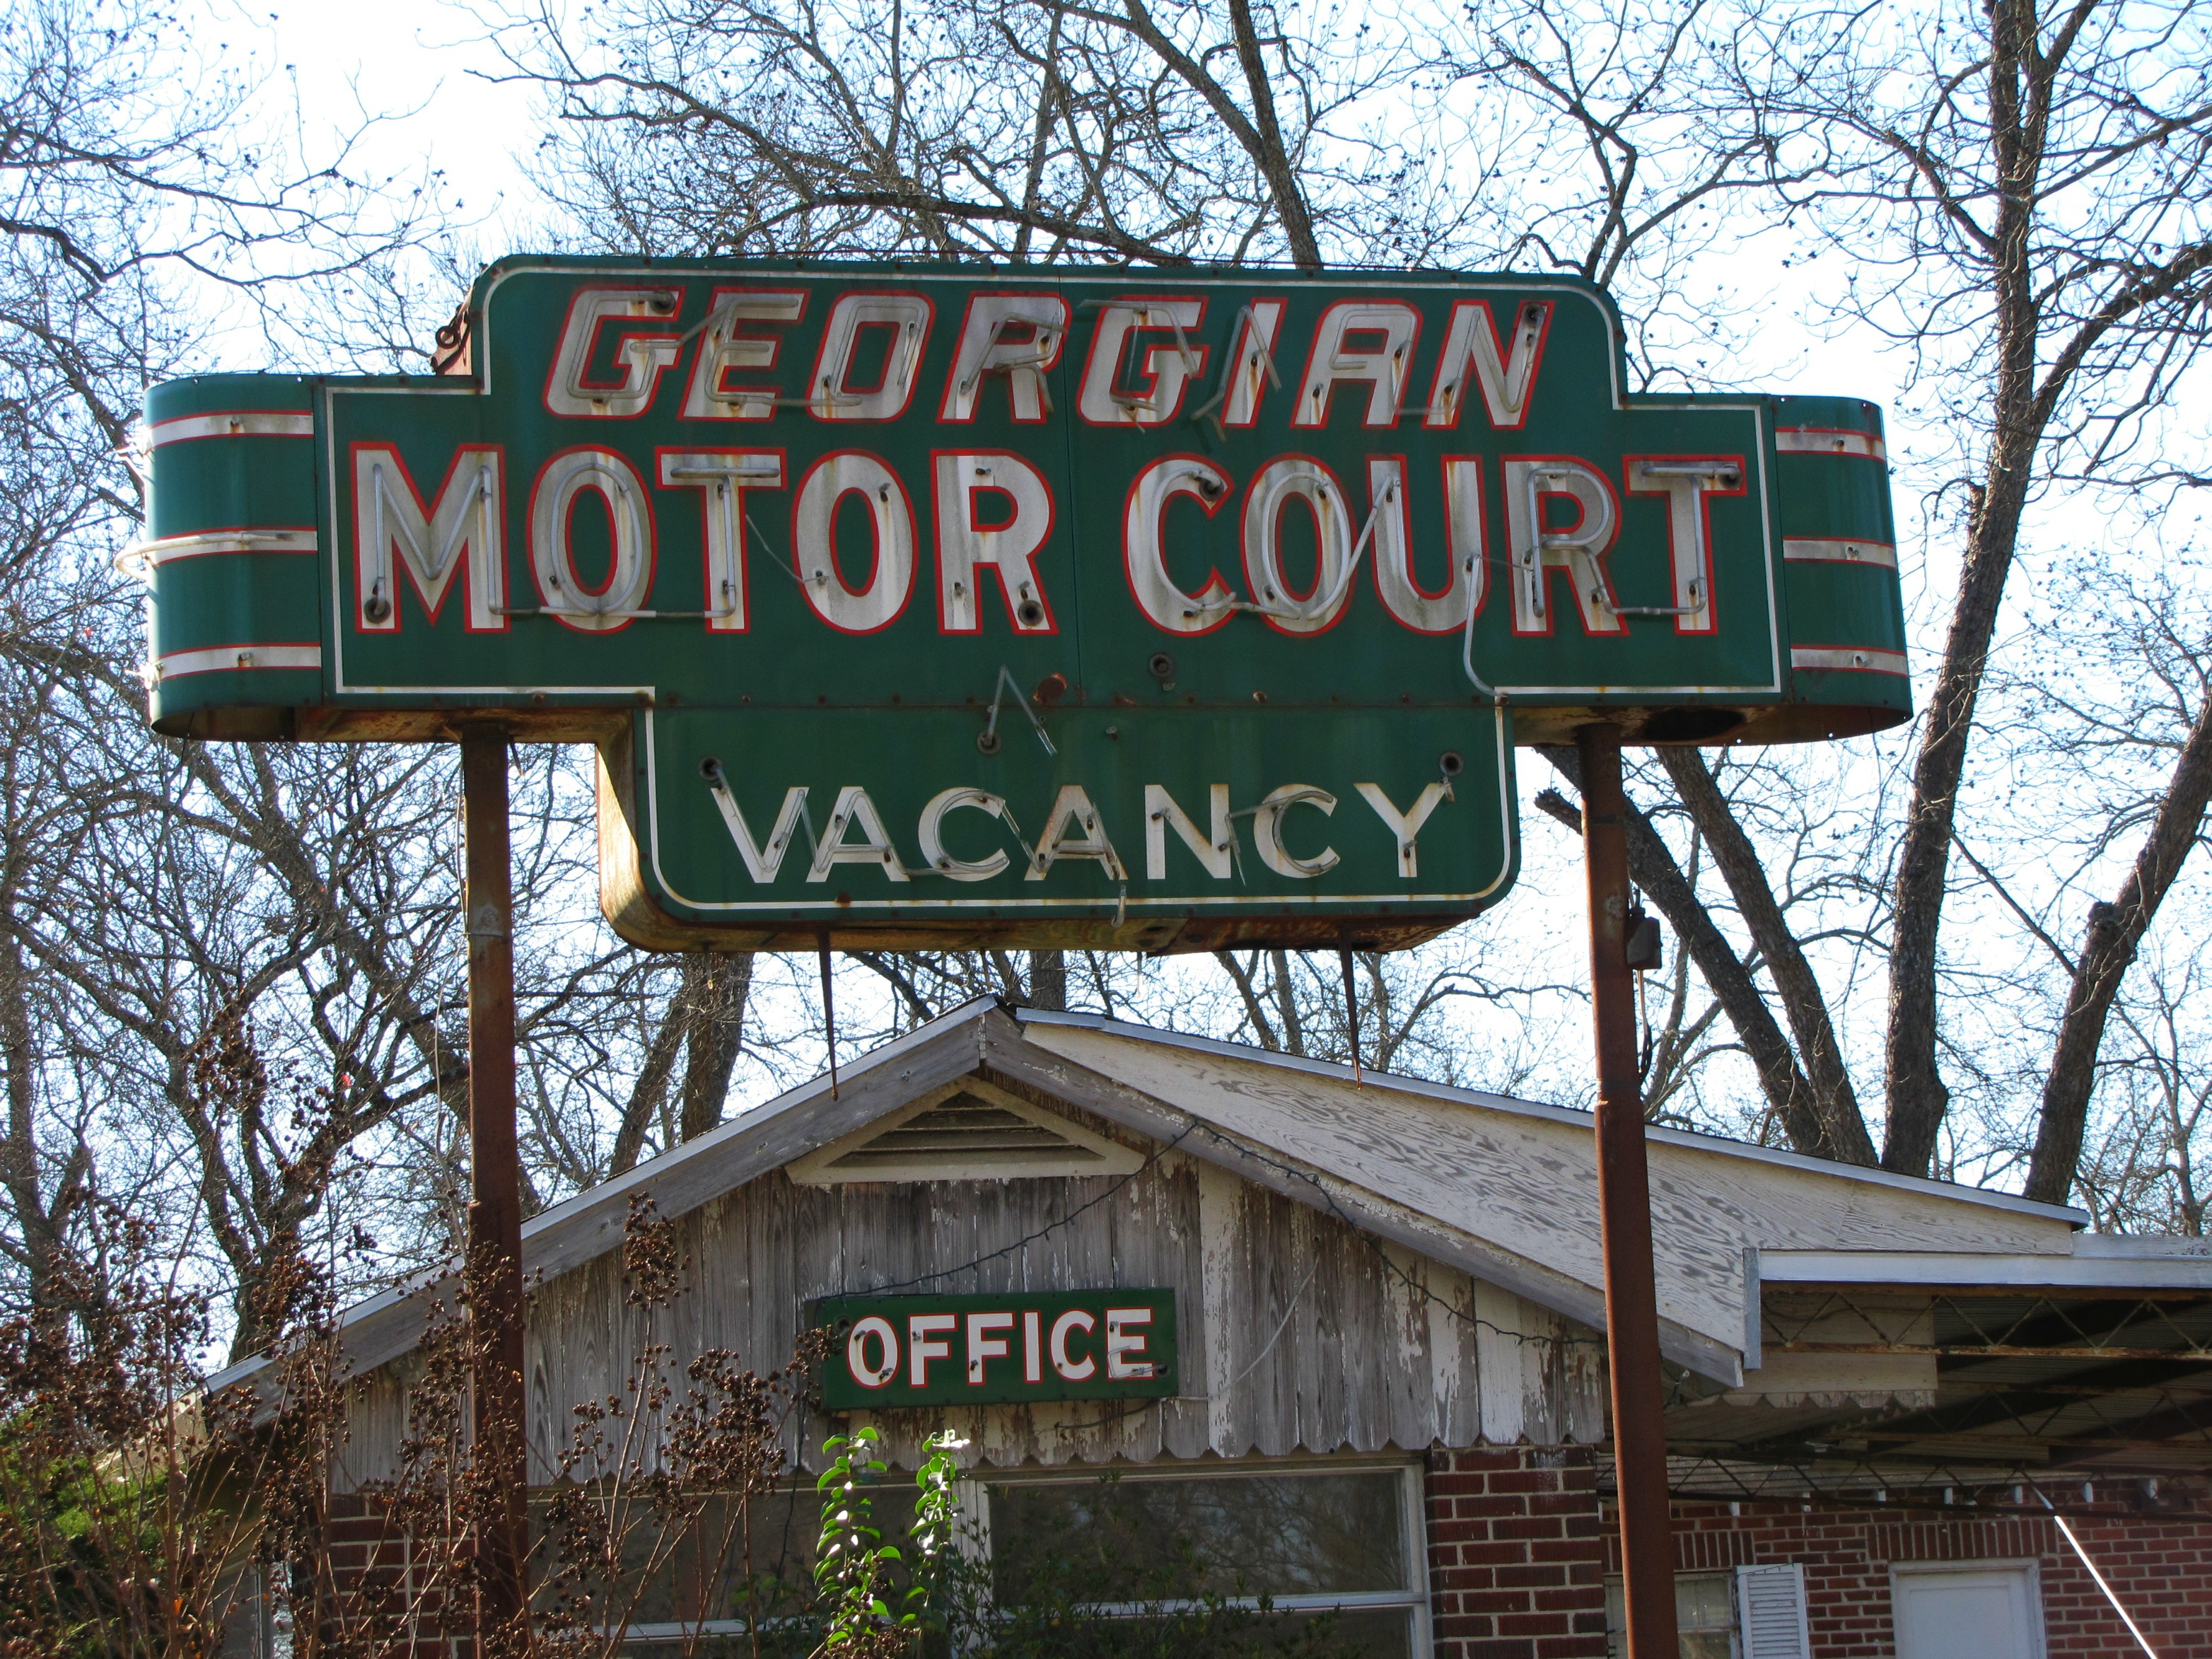 Georgian Motor Court - on old U.S. Route 41 in Cordele, Georgia USA - December 21, 2012